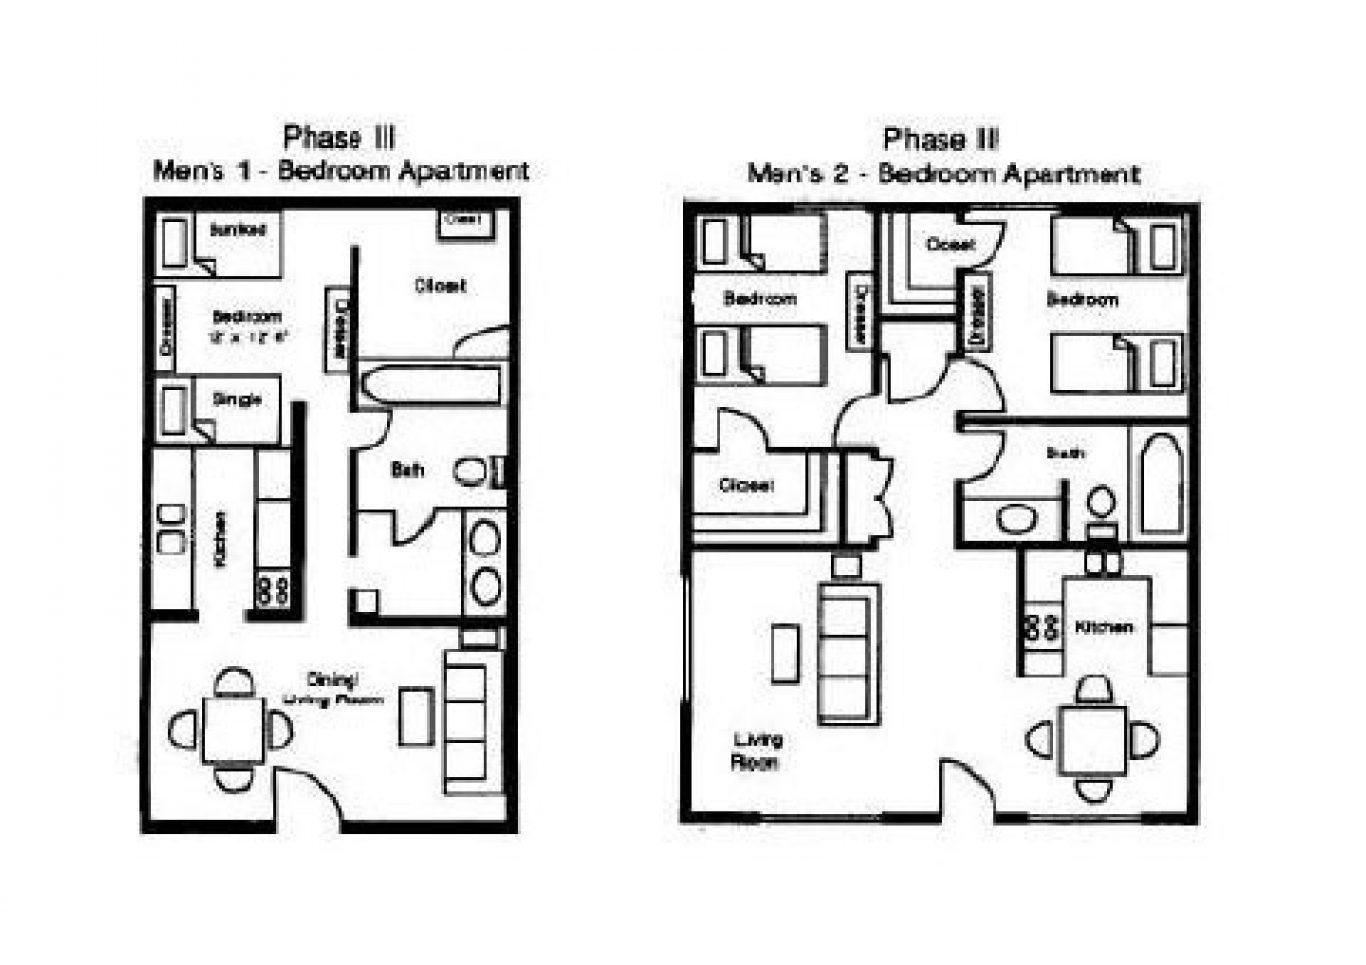 Phase 3 floorplan